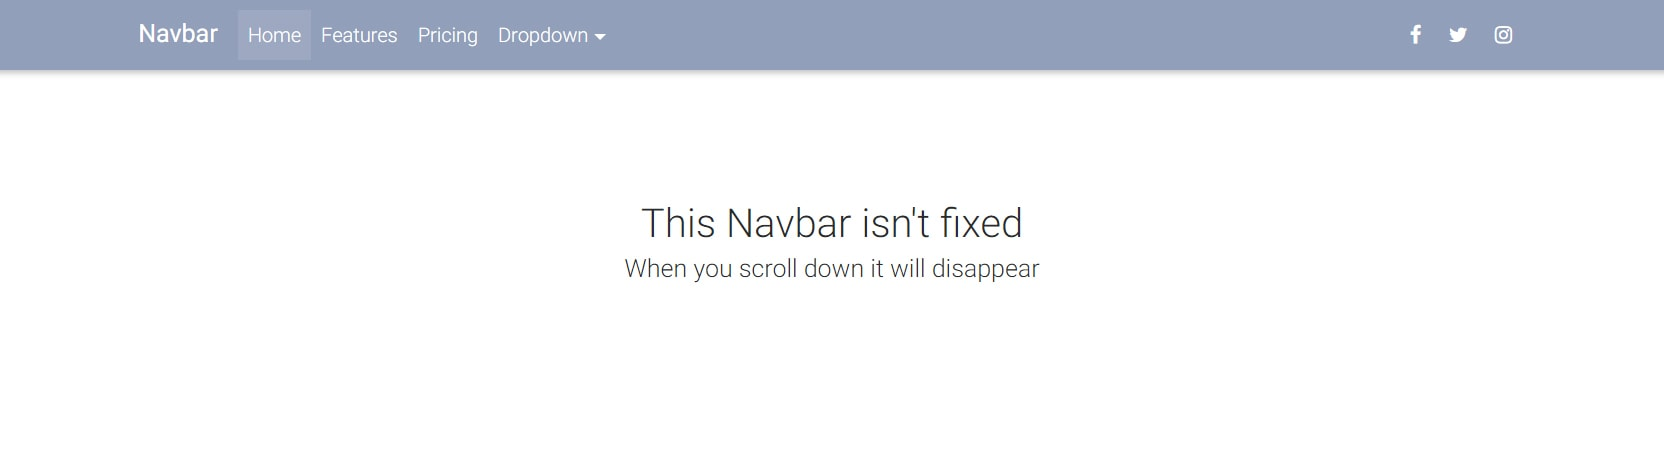 Website with a regular non-fixed Navbar.